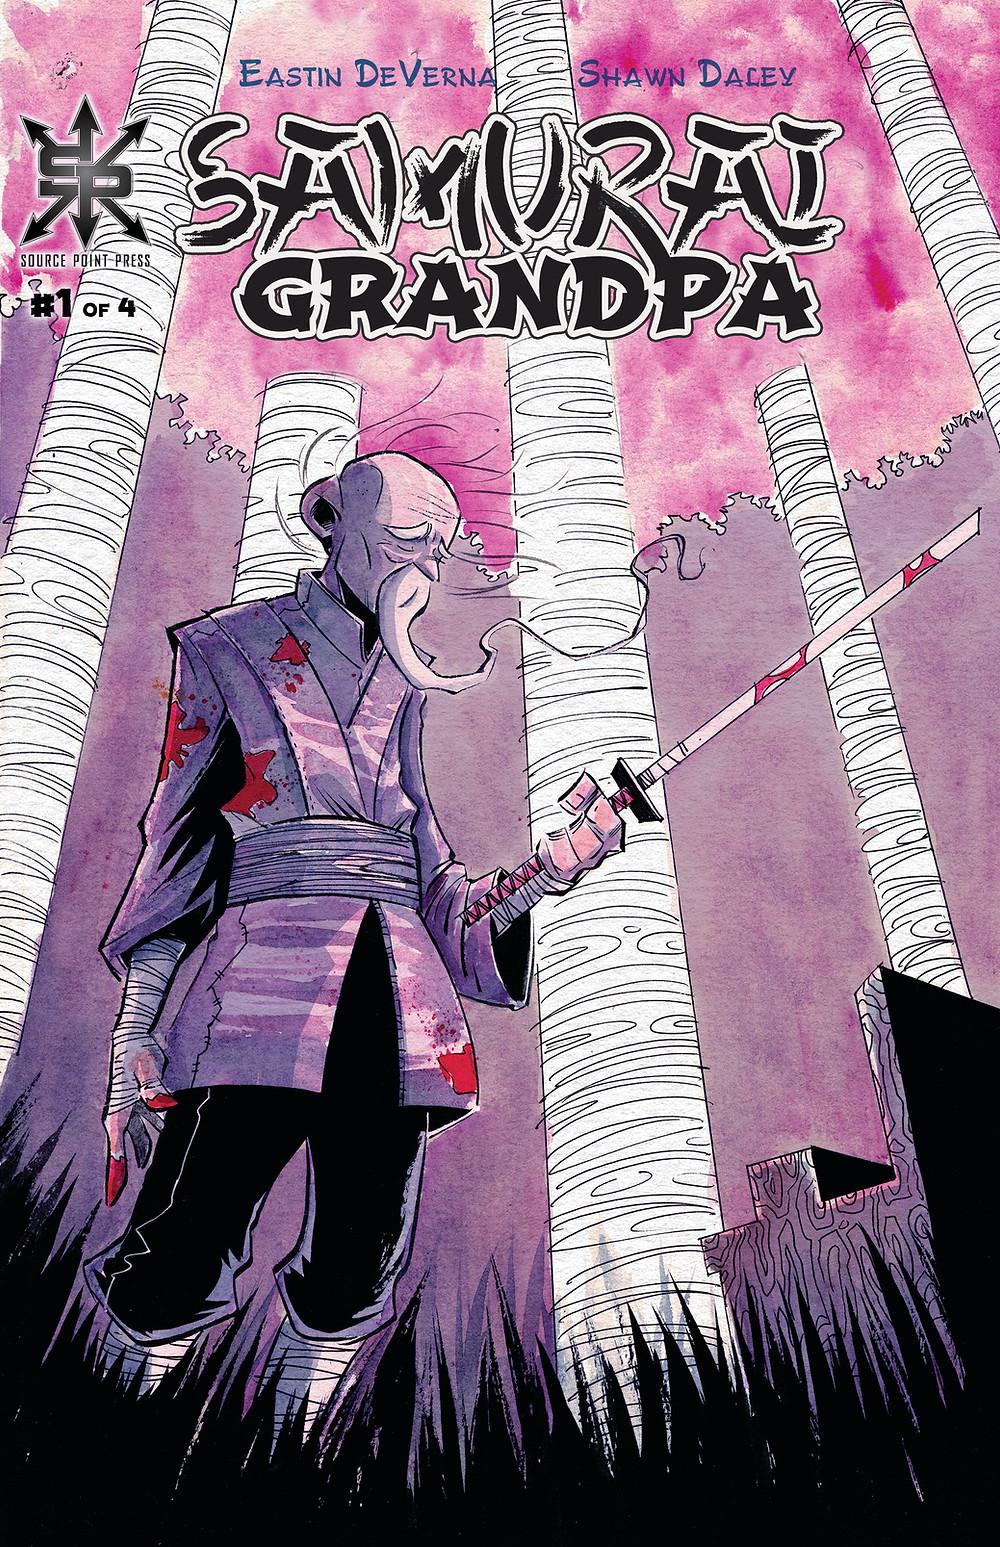 Samurai Grandpa, Vol. 1, cover, Source Point Press, DeVerna/Daley